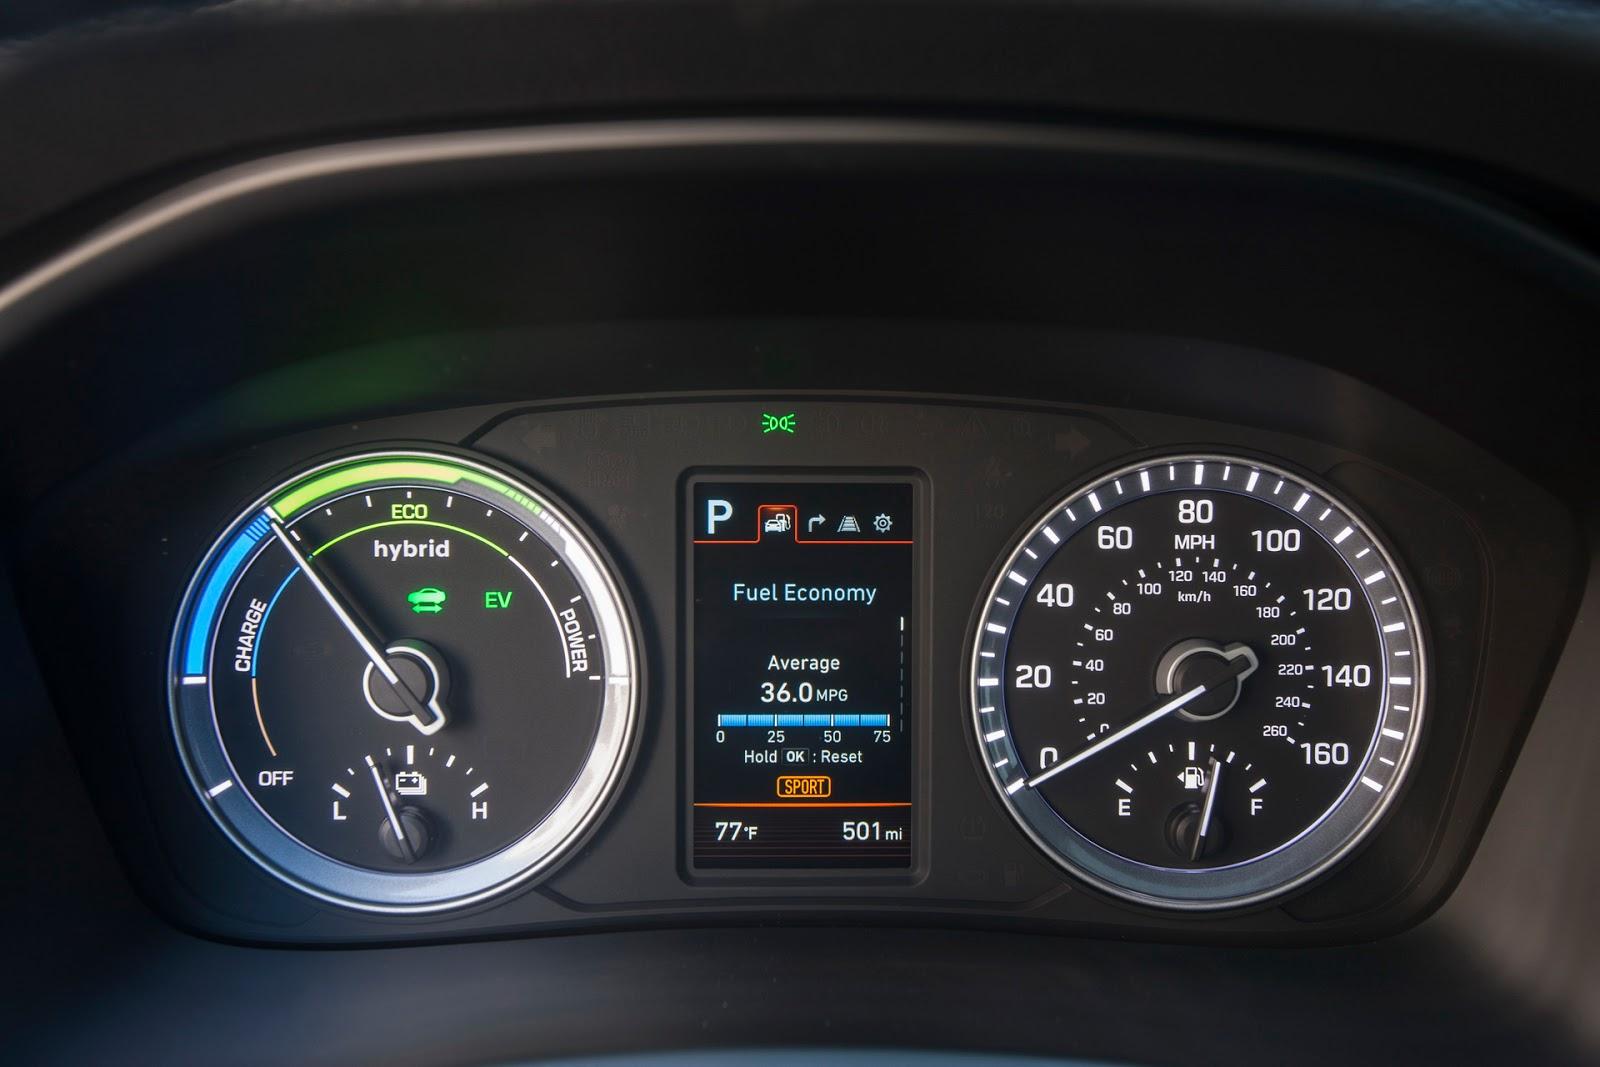 Hybrid Hyundai Sonata 2018 </figcaption> </figure> <p> Hyundai Hyundai Hyundai Sonata 2018 Hybrid Hyundai Sonata 2018 Hybrid Sonata is equipped with a power plant consisting of: </p> <ul> <li> 2-liter gasoline engine; </li> <li> electric motor; </li> <li> 6-band &quot;machine&quot;; </li> <li> batteries with a capacity of 1.76 kilowatt-hours. </li> </ul> <p> The total output is 195 horsepower. </p> <p> The rechargeable version has a more powerful power plant and batteries with a capacity of 9.8 kilowatt-hours. On electric traction, such a &quot;Sonata&quot; can travel 43 kilometers </p> <p> <img class=